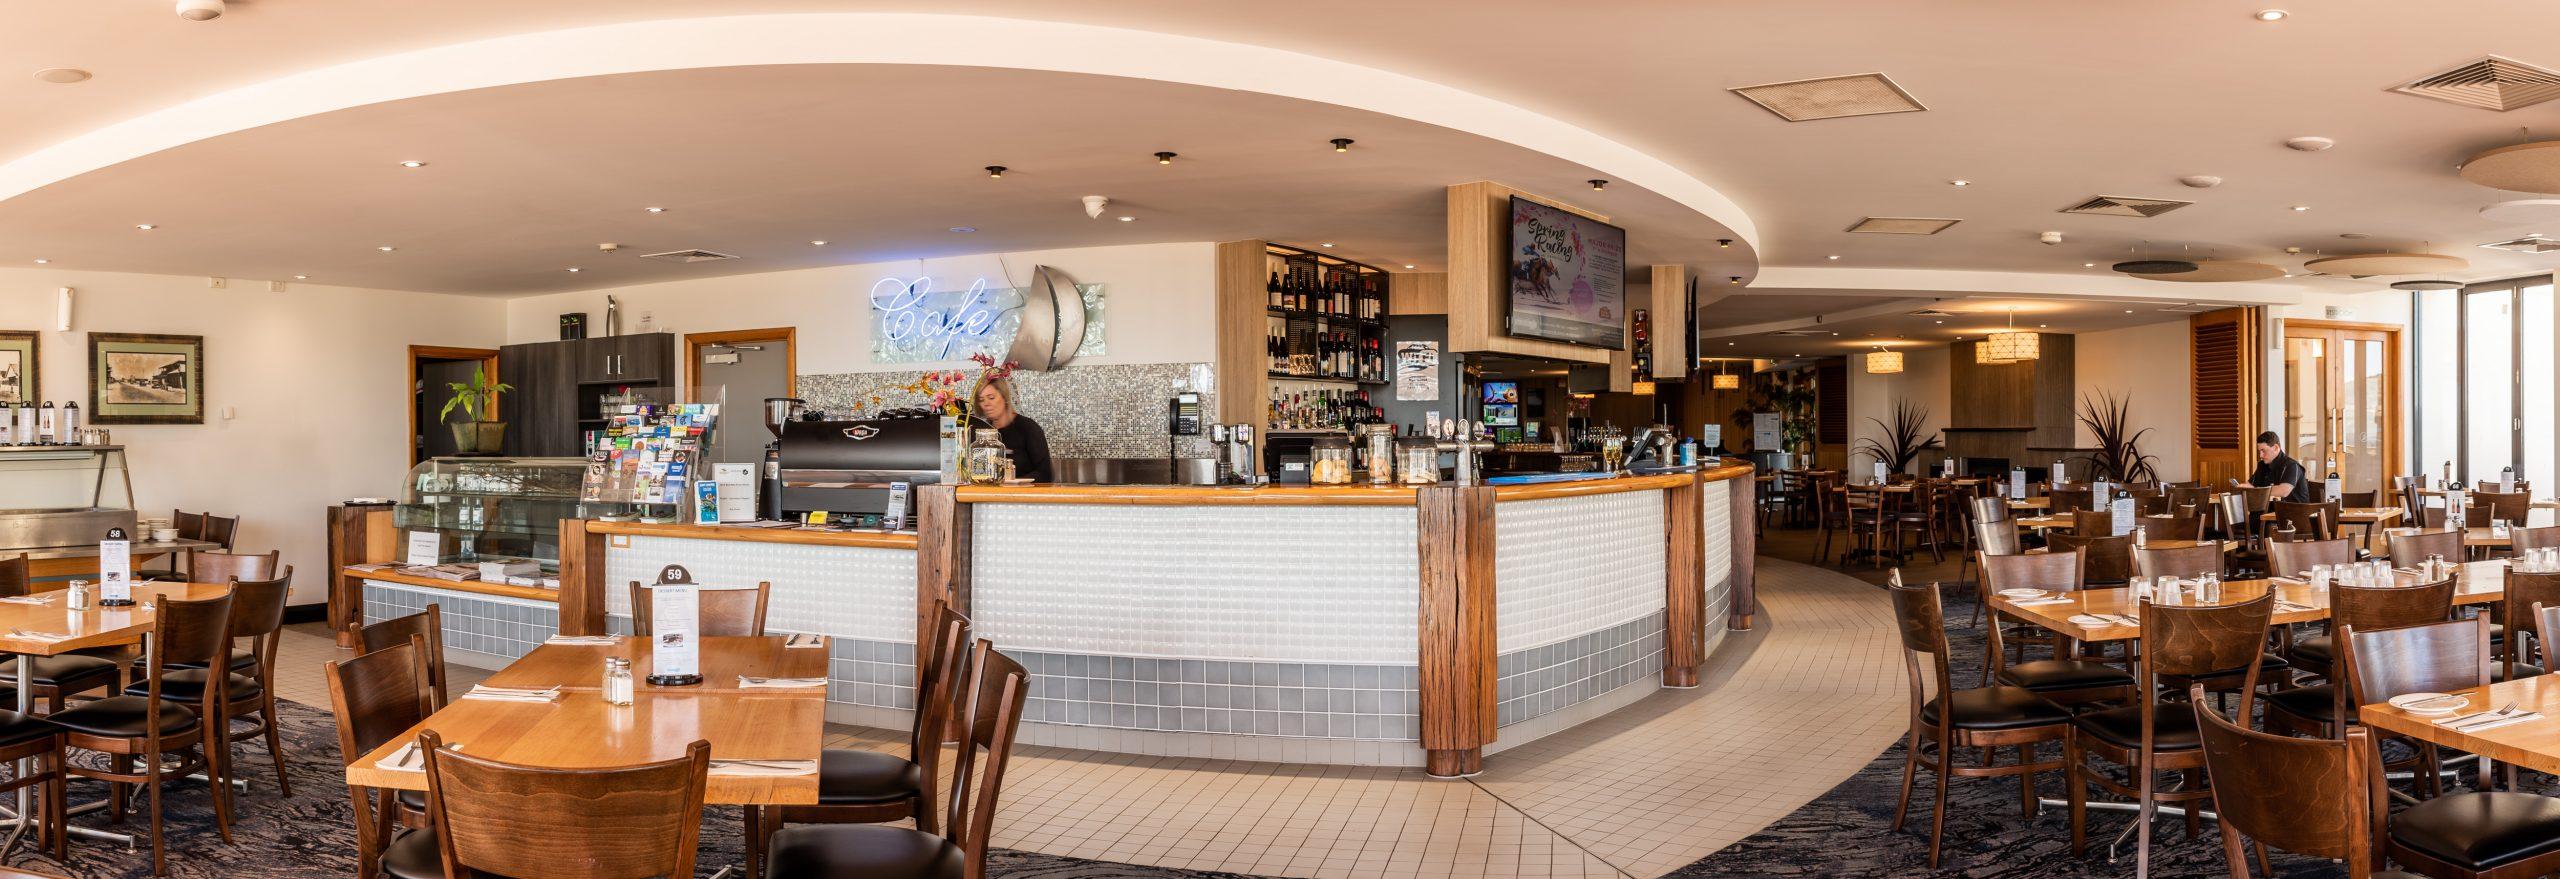 Panarama Cafe-Bistro-Bar